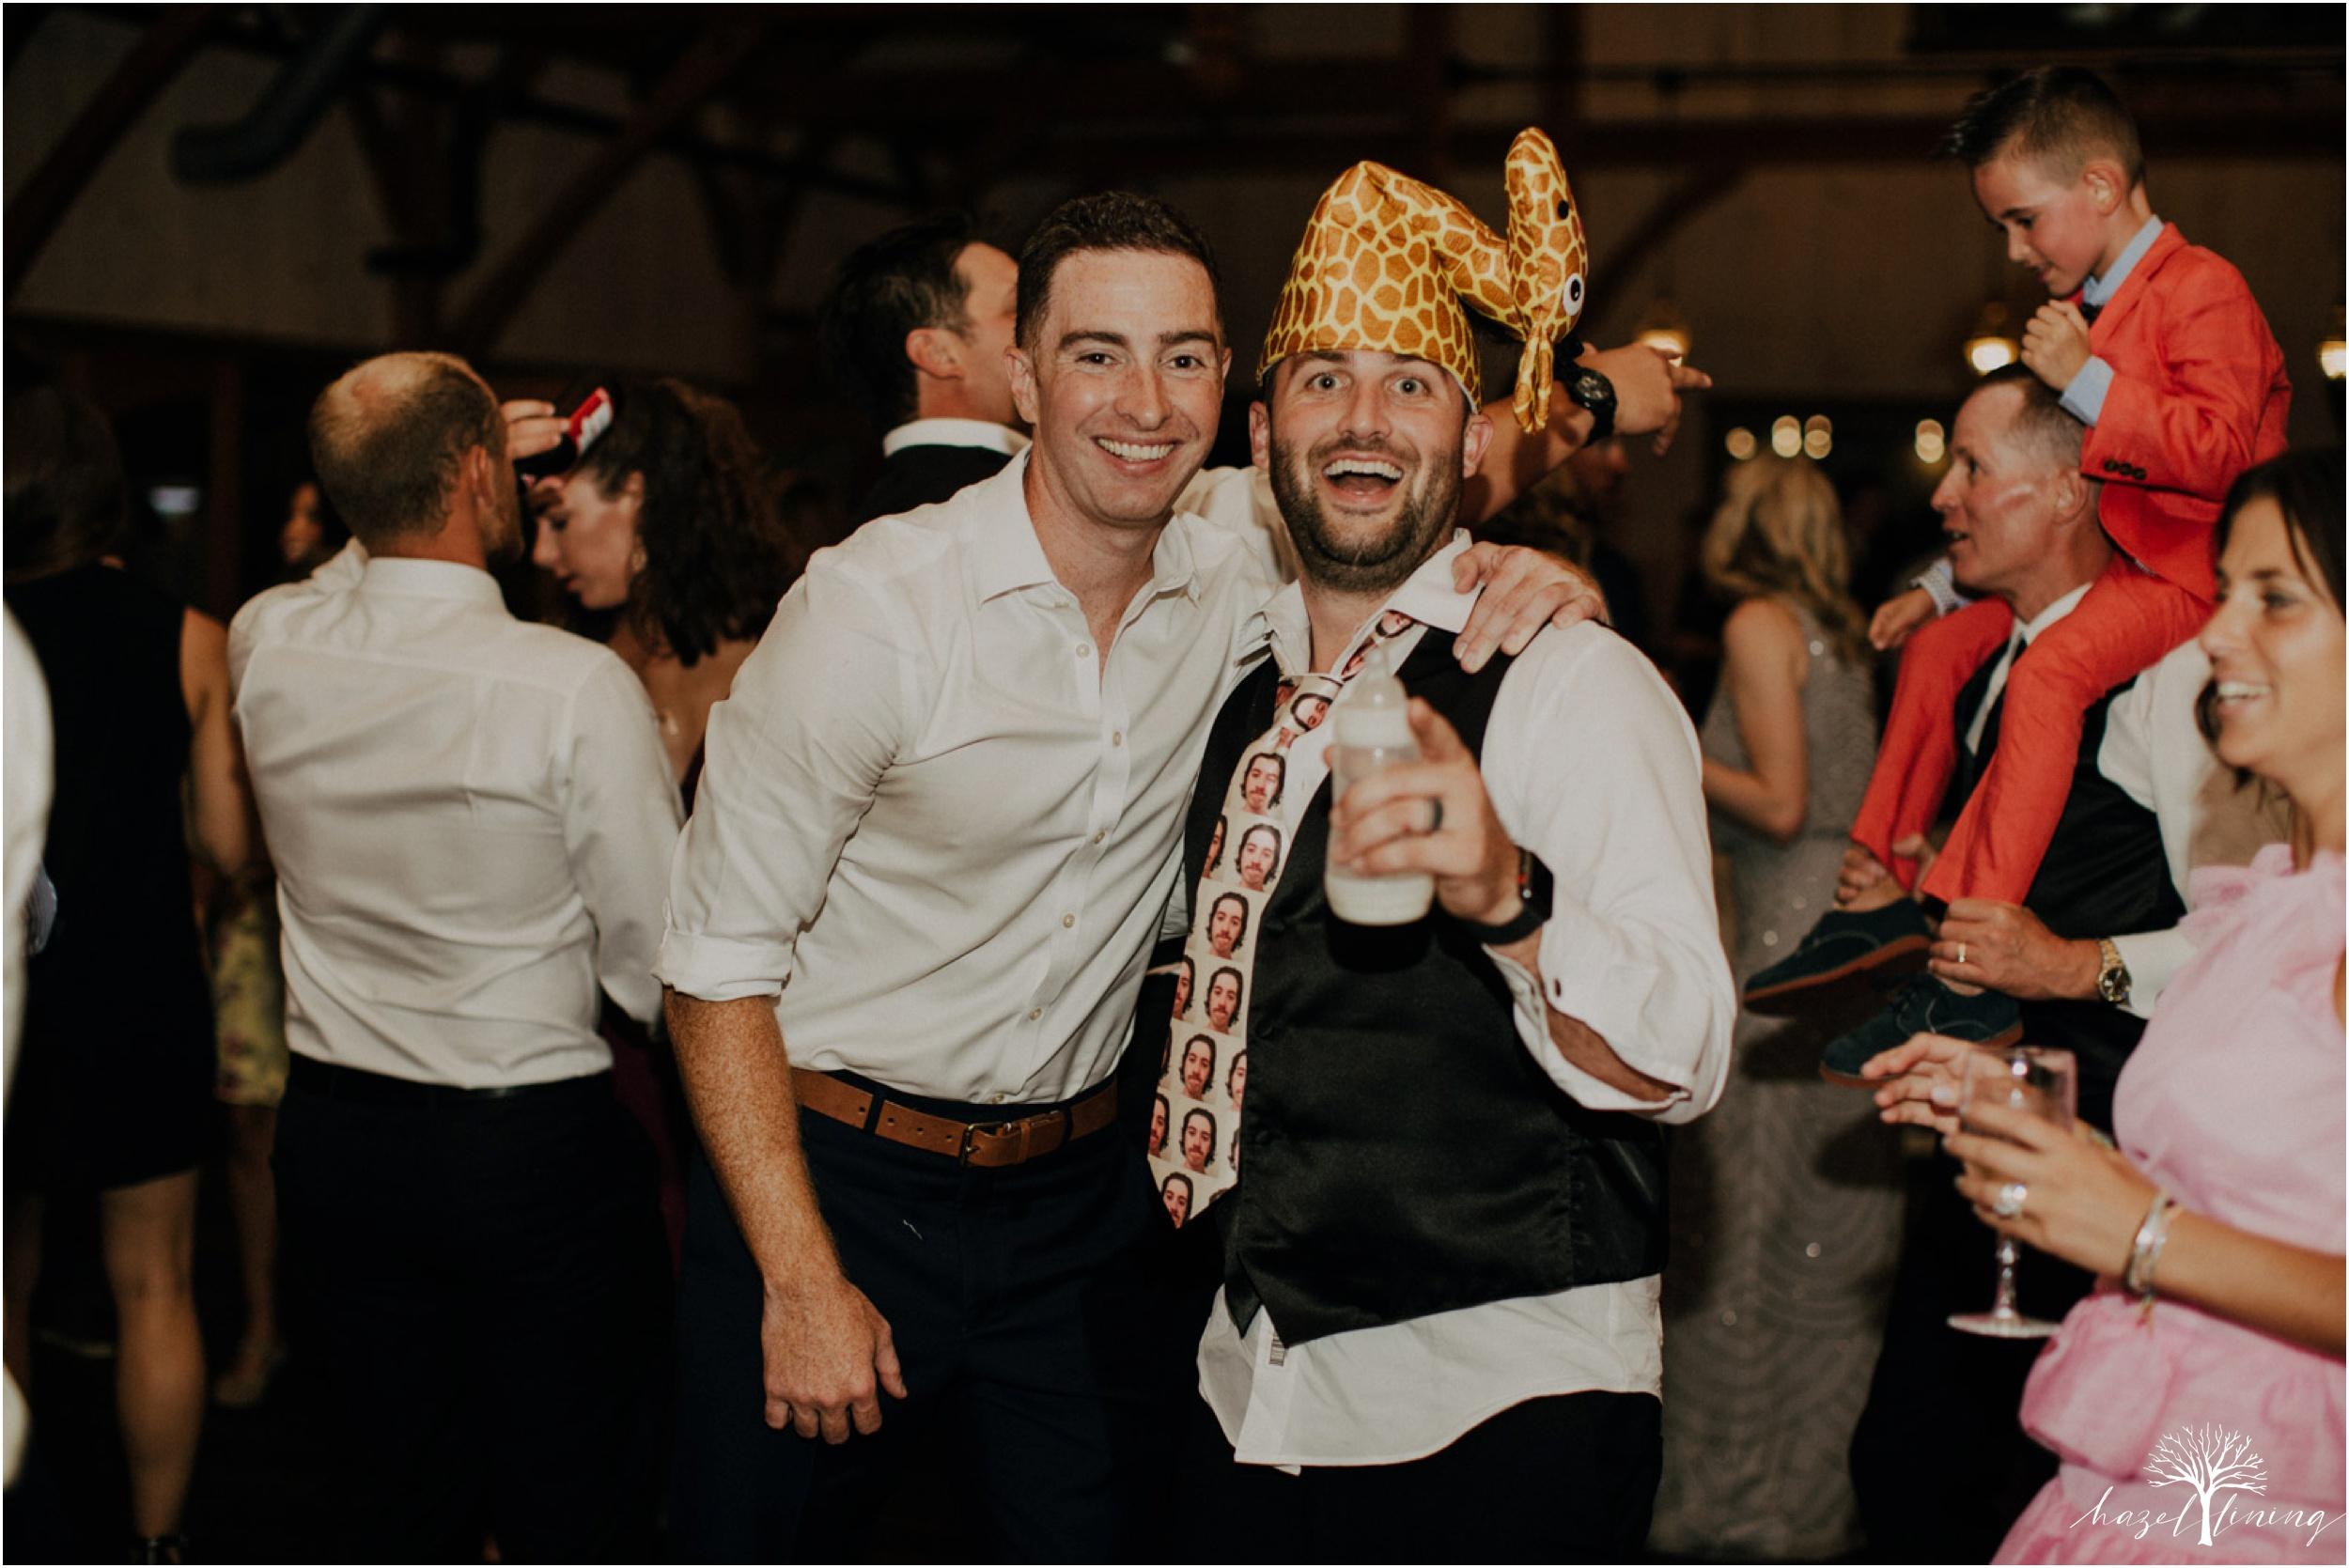 maureen-hepner-anthony-giordano-rose-bank-winery-newtow-pennsylvania-luxury-summer-wedding-hazel-lining-photography-destination-elopement-wedding-engagement-photography_0148.jpg